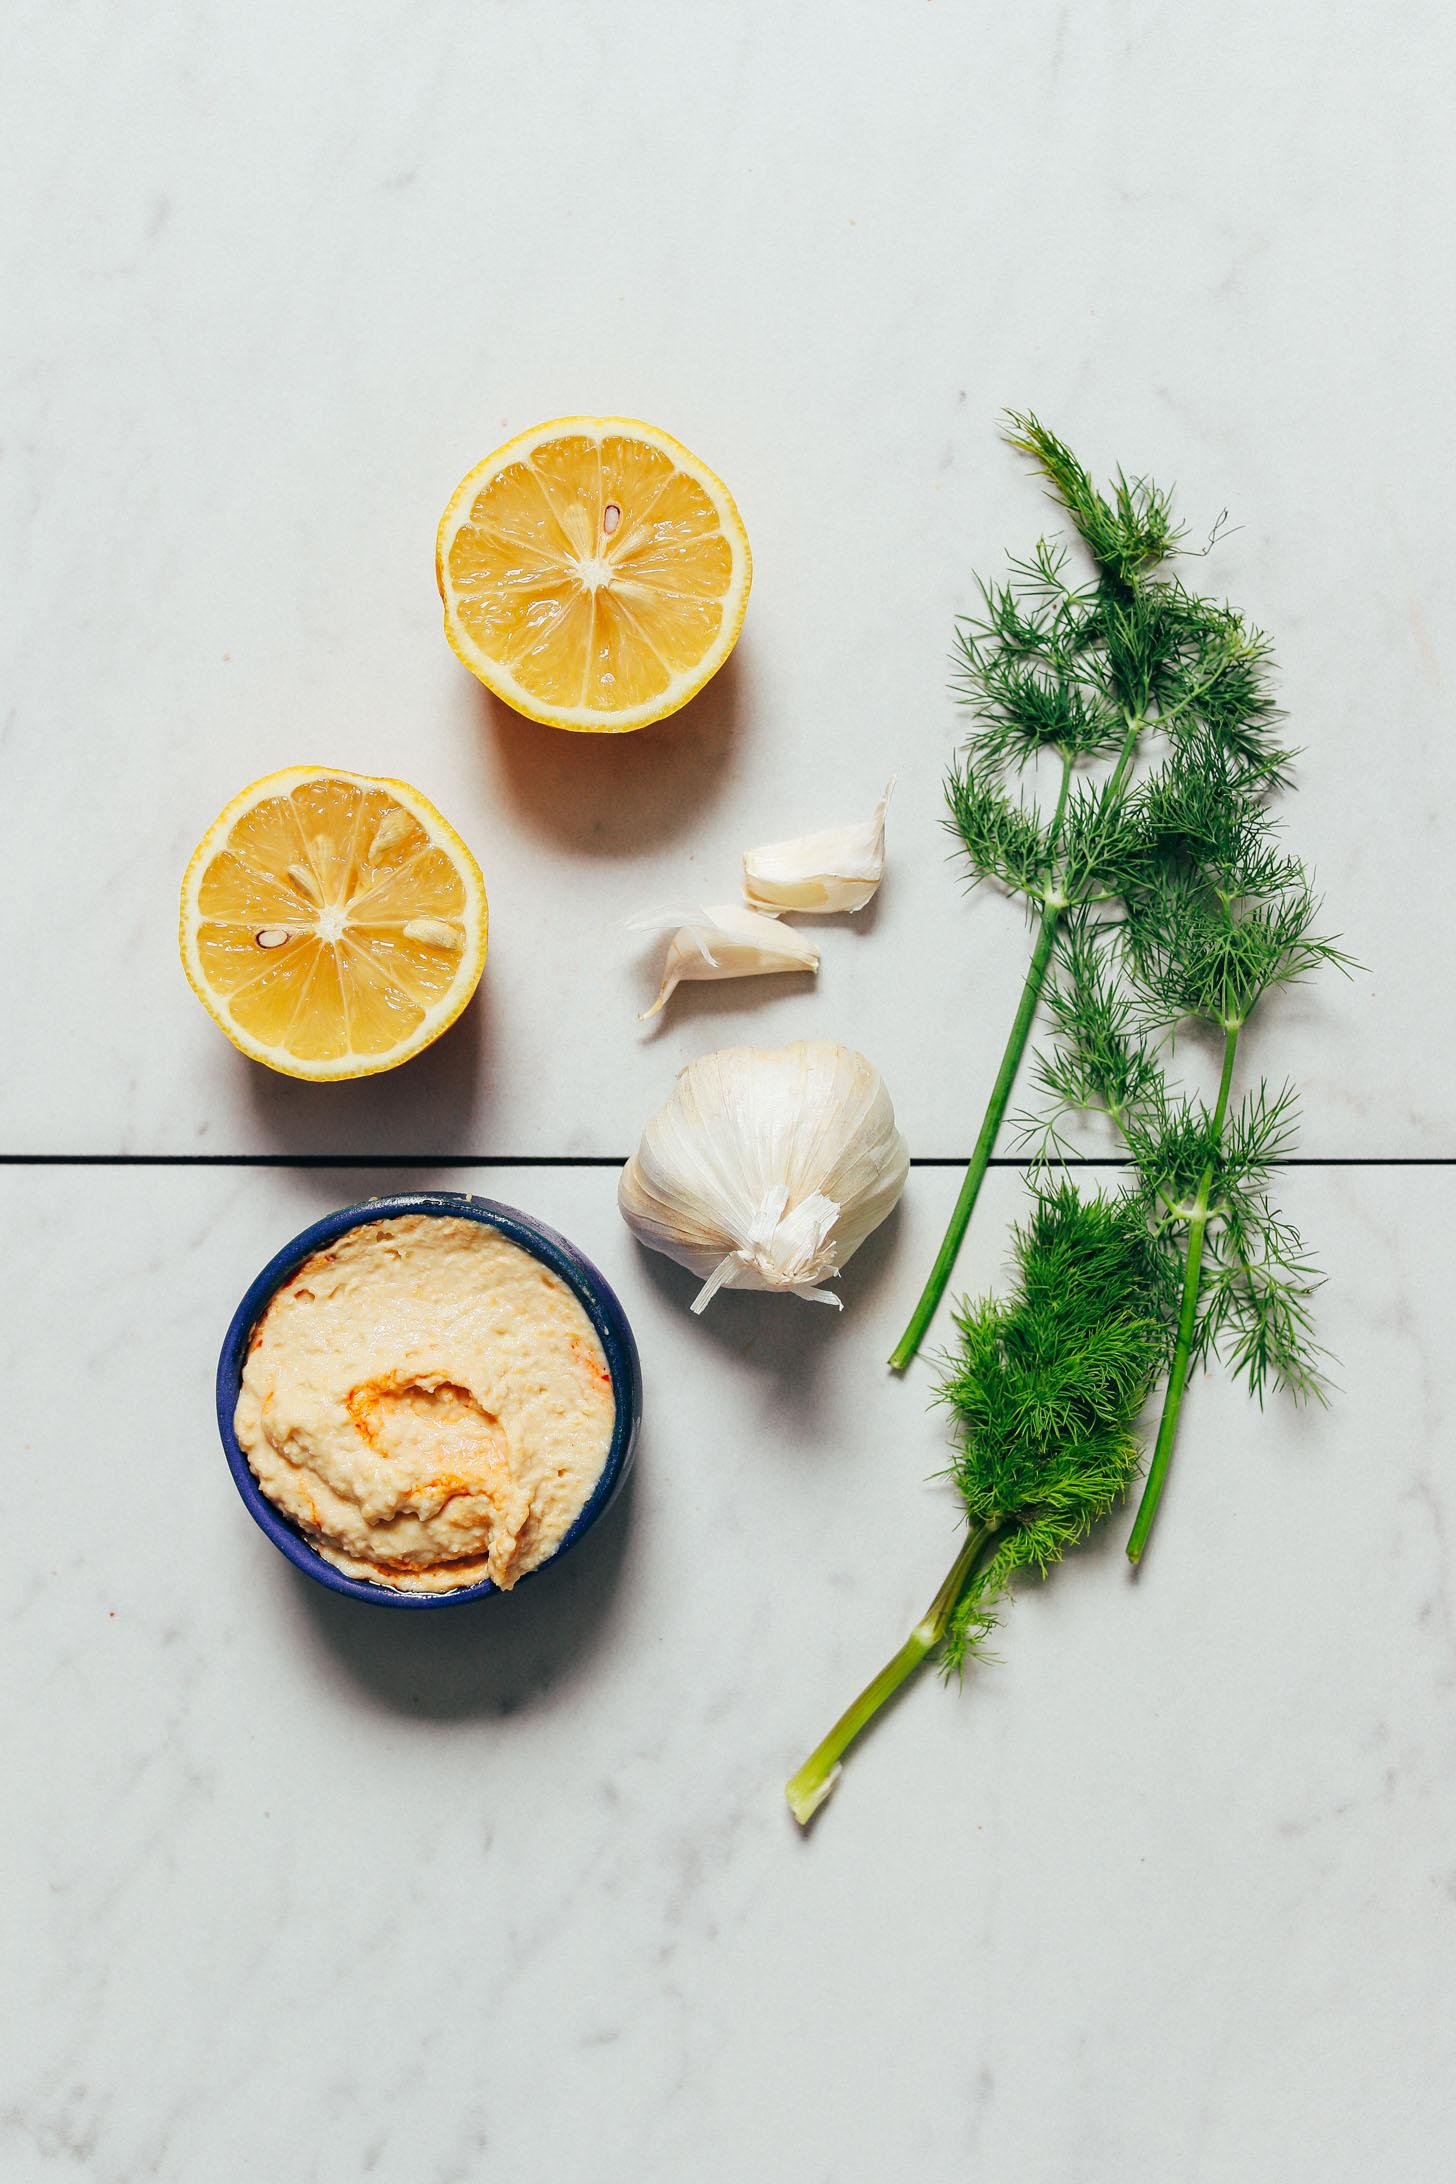 Hummus, garlic, fresh dill, and lemon for making our simple Hummus Garlic Sauce recipe